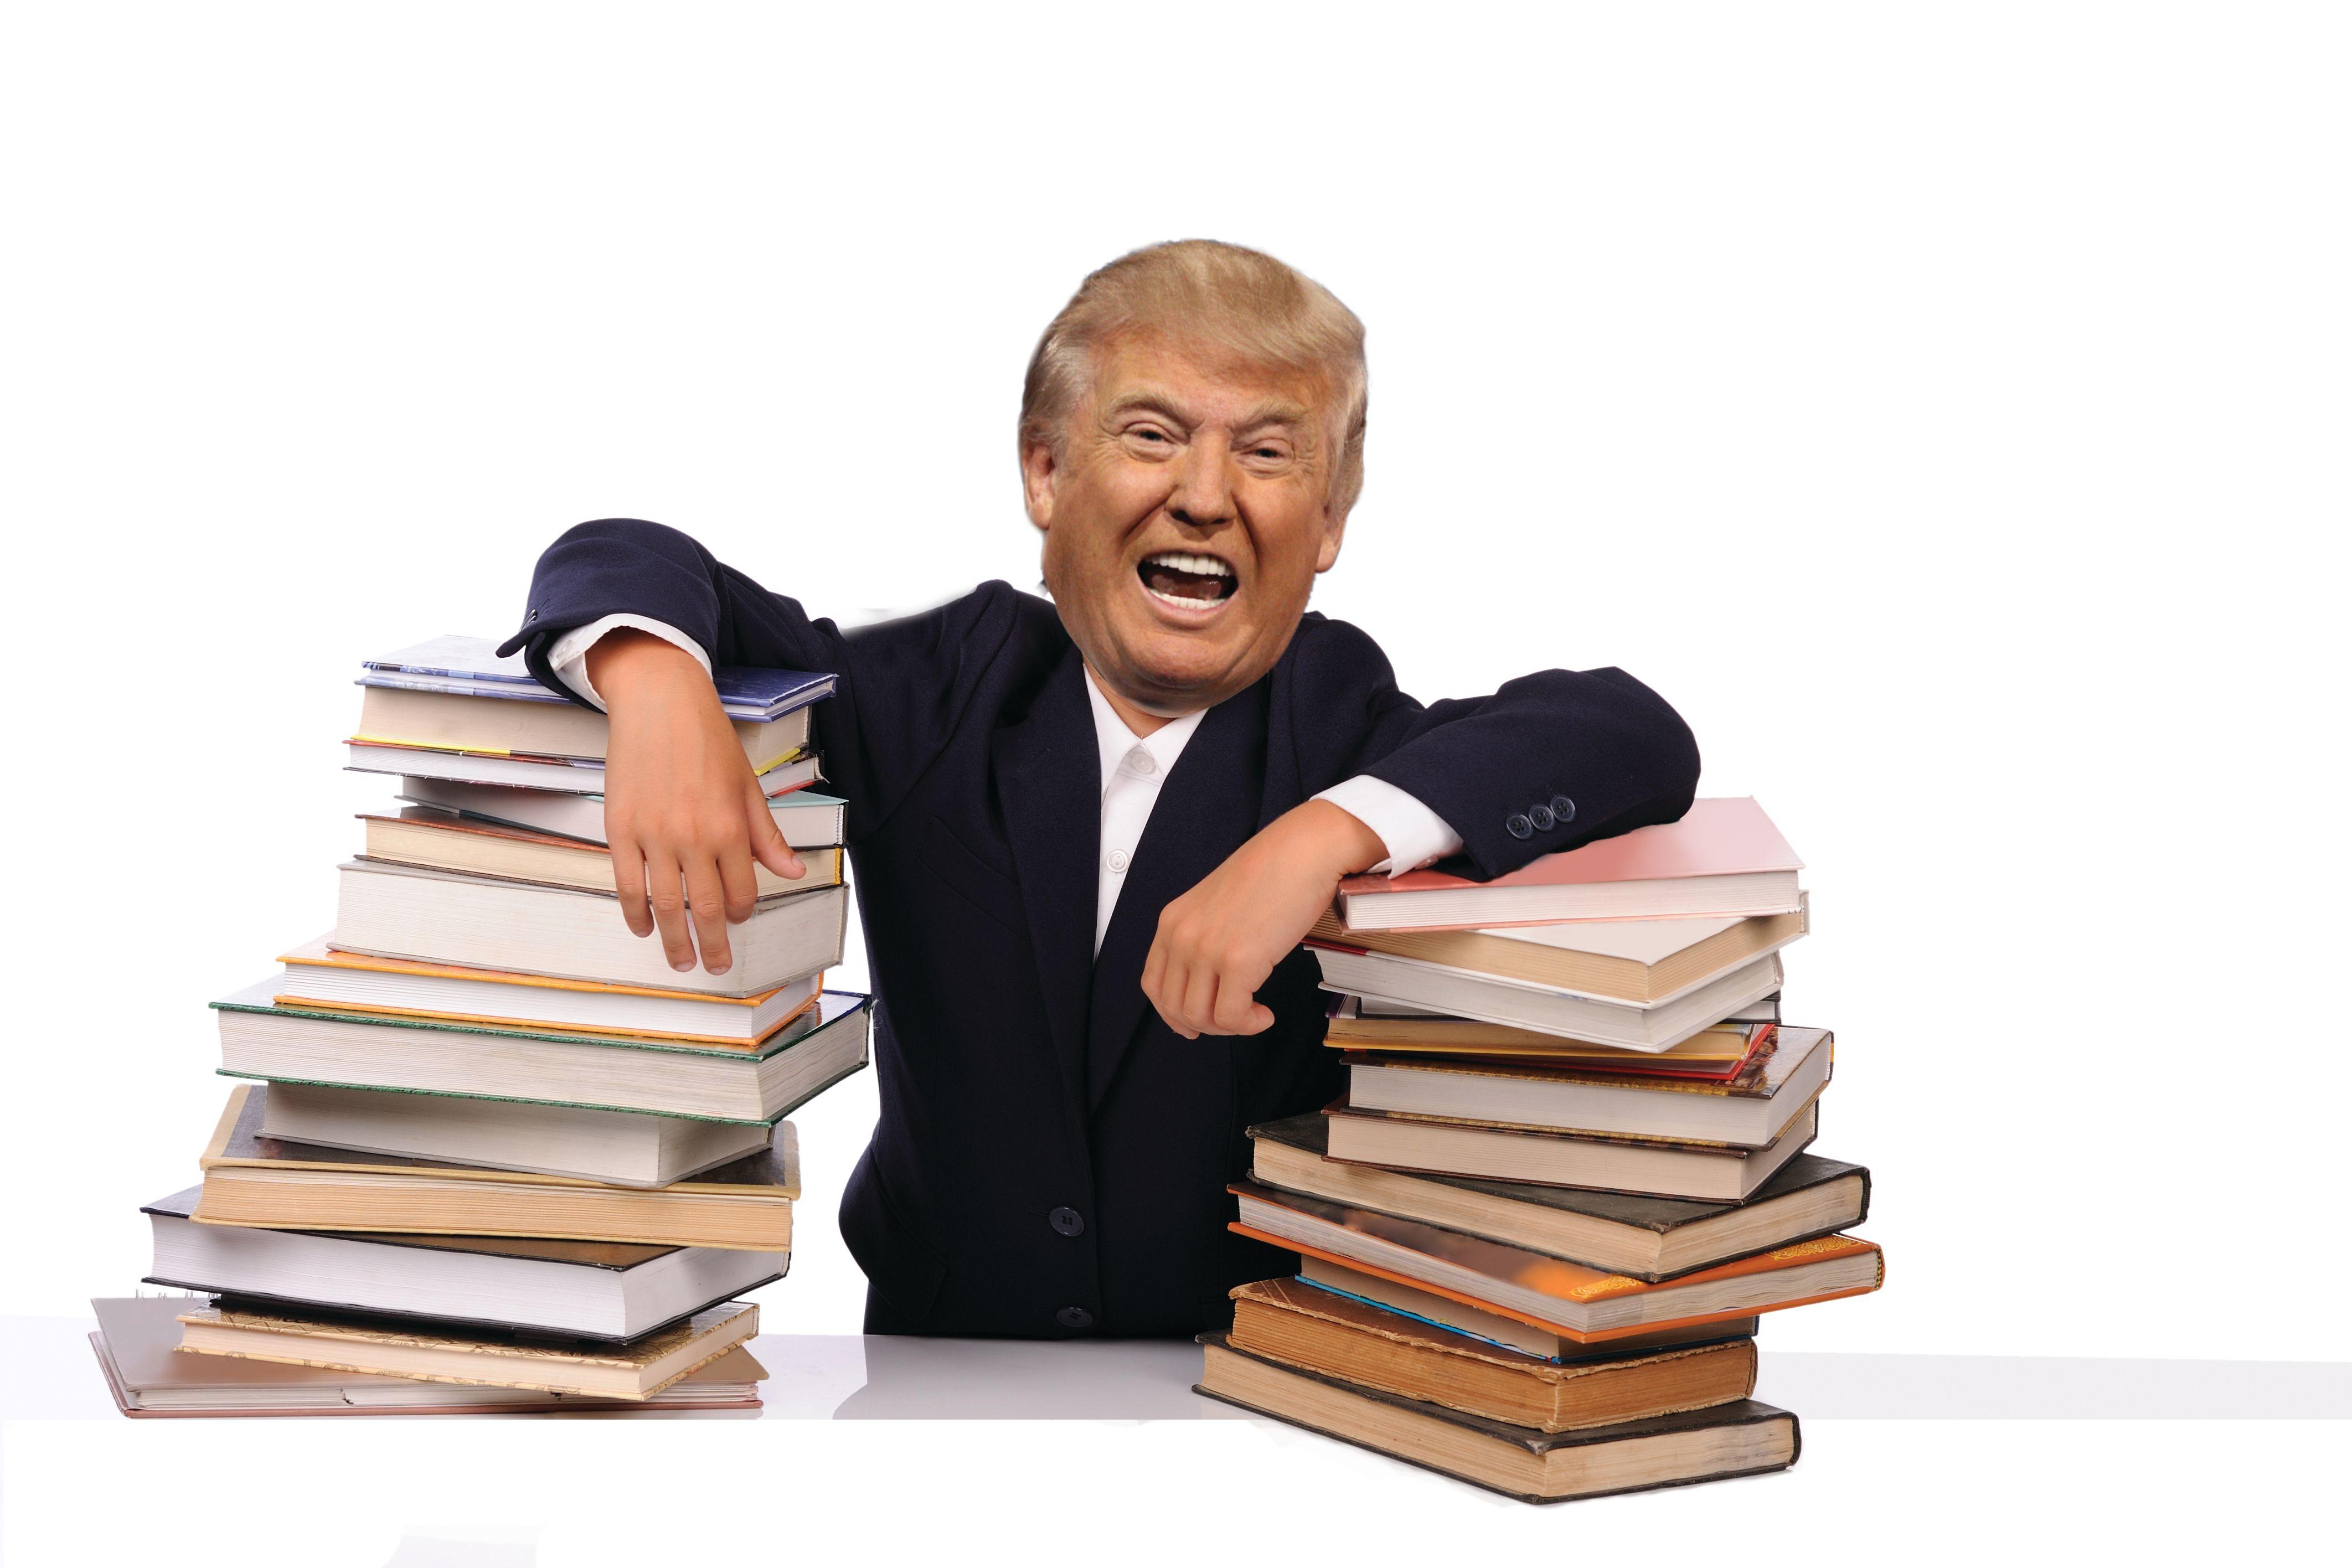 Trump stack ydfmpa